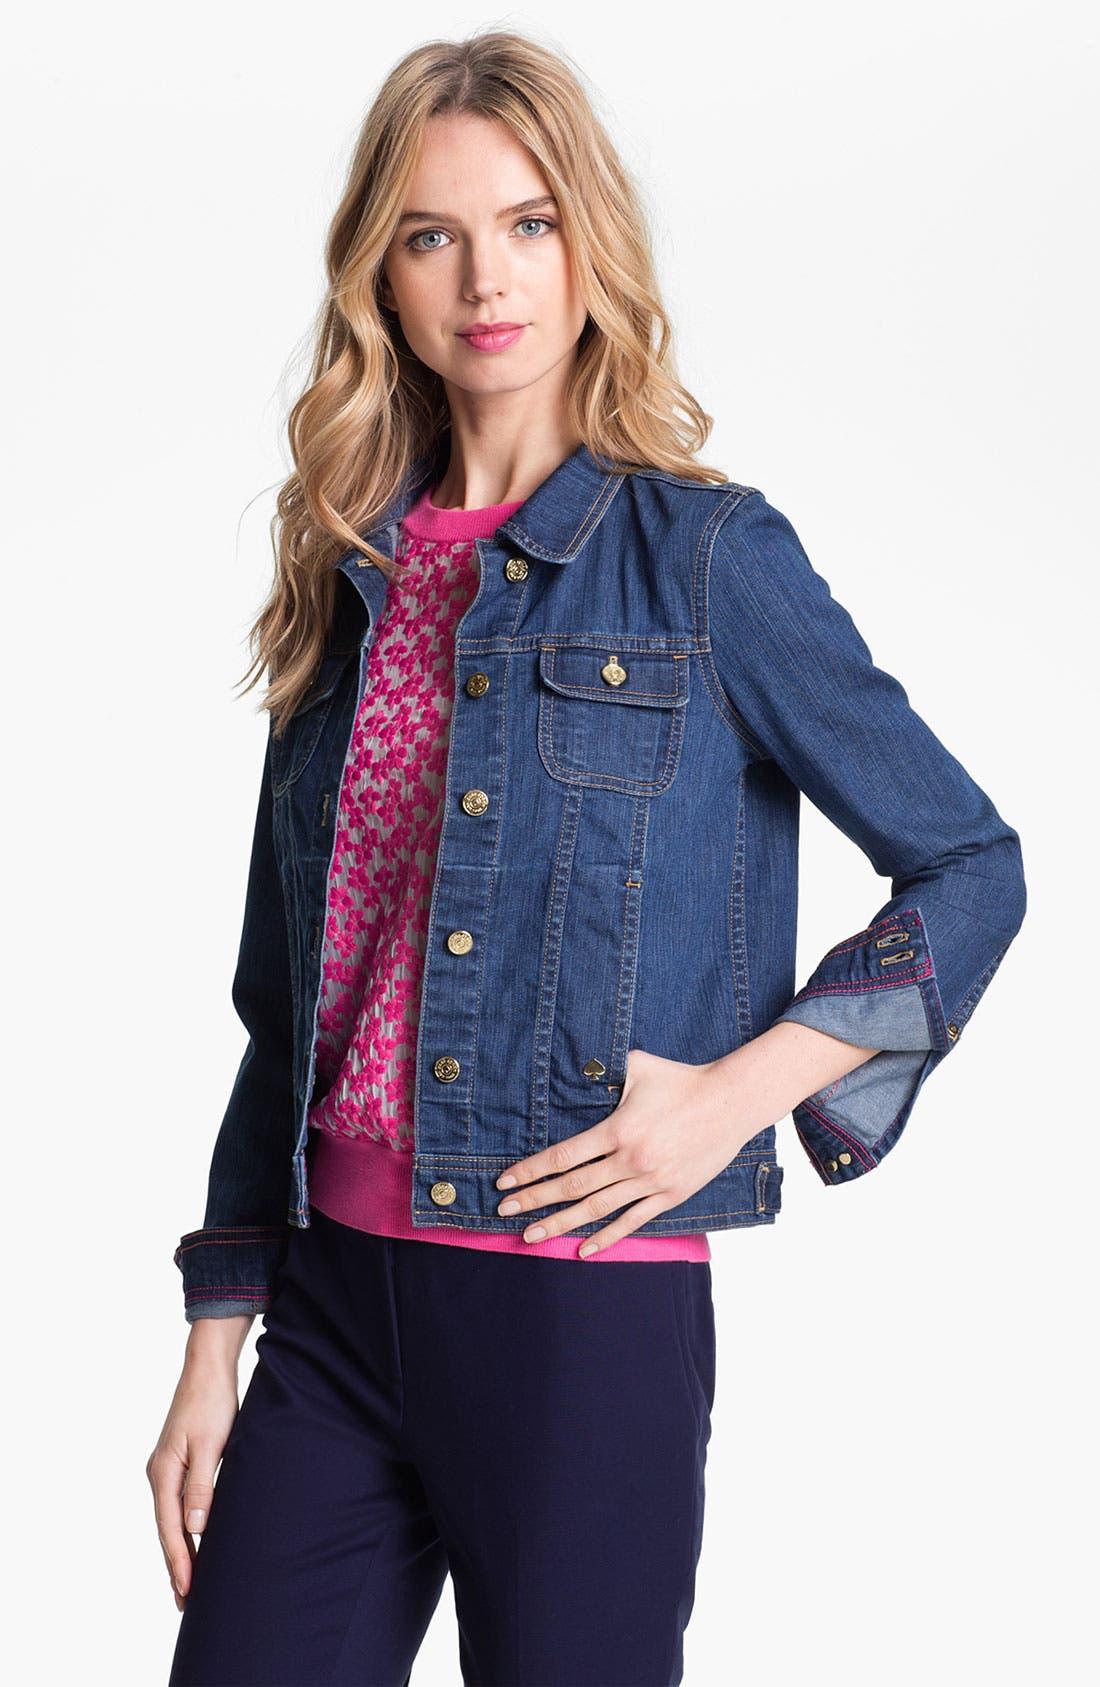 Main Image - kate spade new york 'broome street' denim jacket